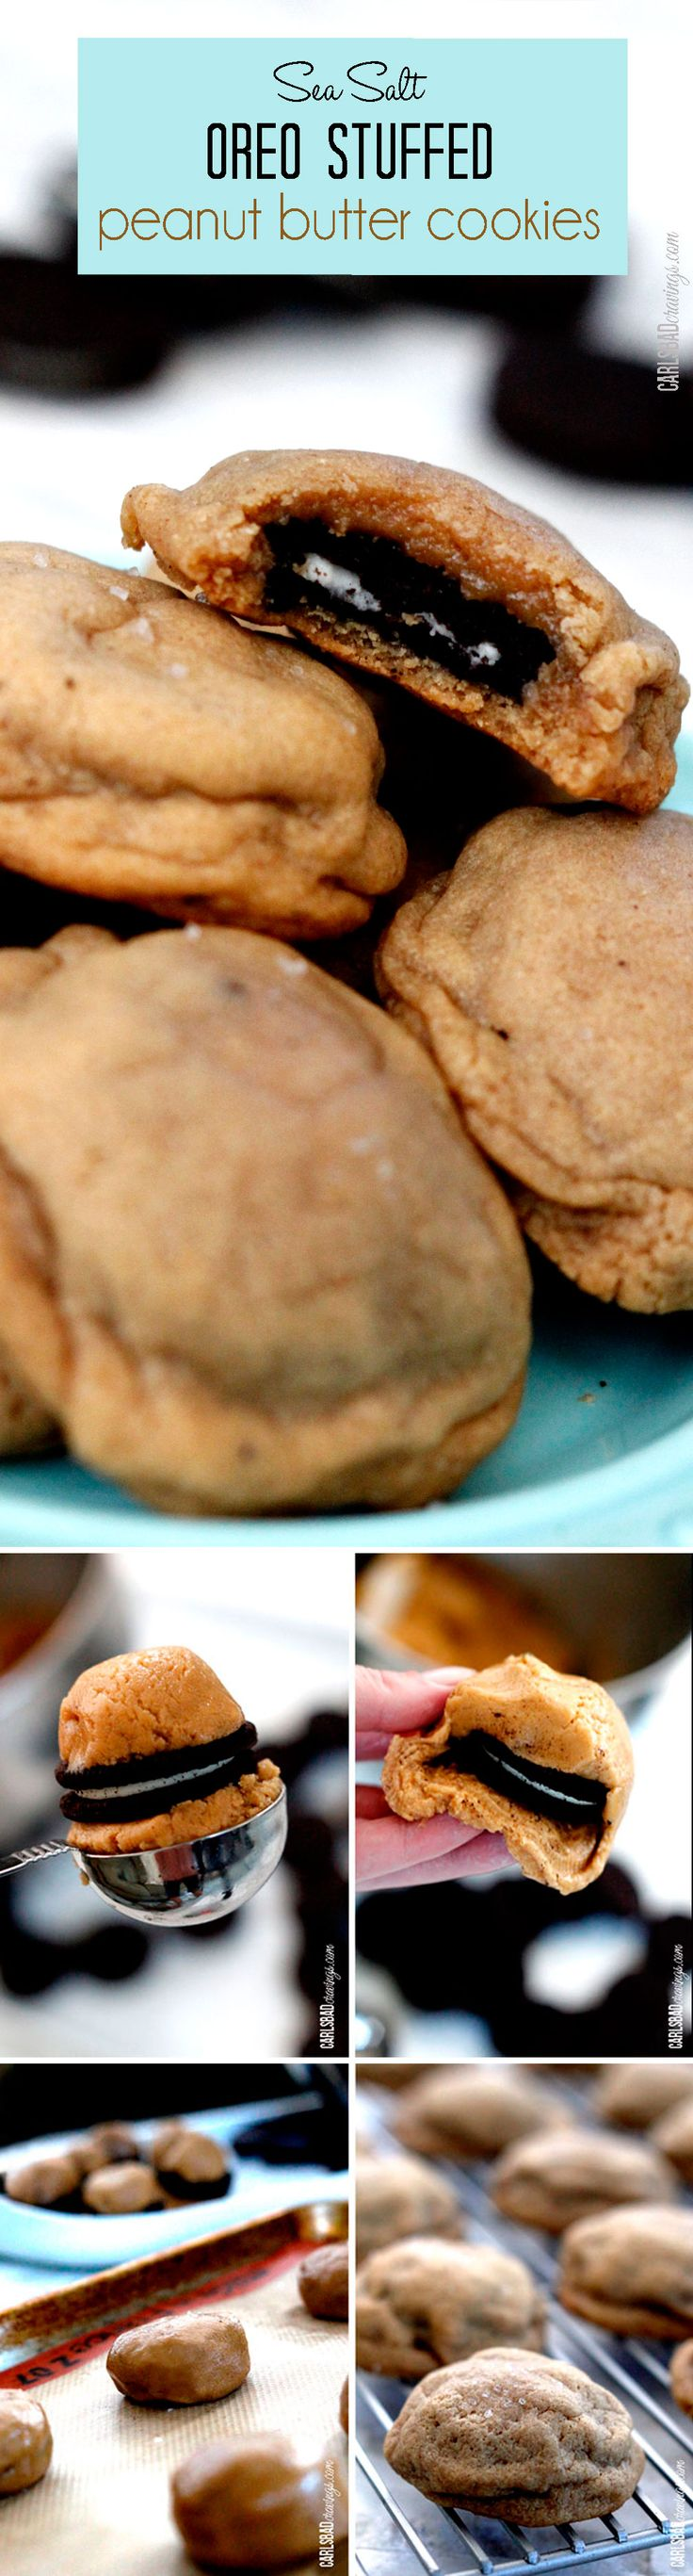 Sea Salt Oreo-Stuffed Peanut Butter Cookies -- soft and chewy peanut butter cookies with soft, melty Oreos inside balanced by savory sea salt. Such a fun cookie to bring to friends and parties! http://www.carlsbadcravings.com/sea-salt-oreo-stuffed-peanut-butter-cookies/